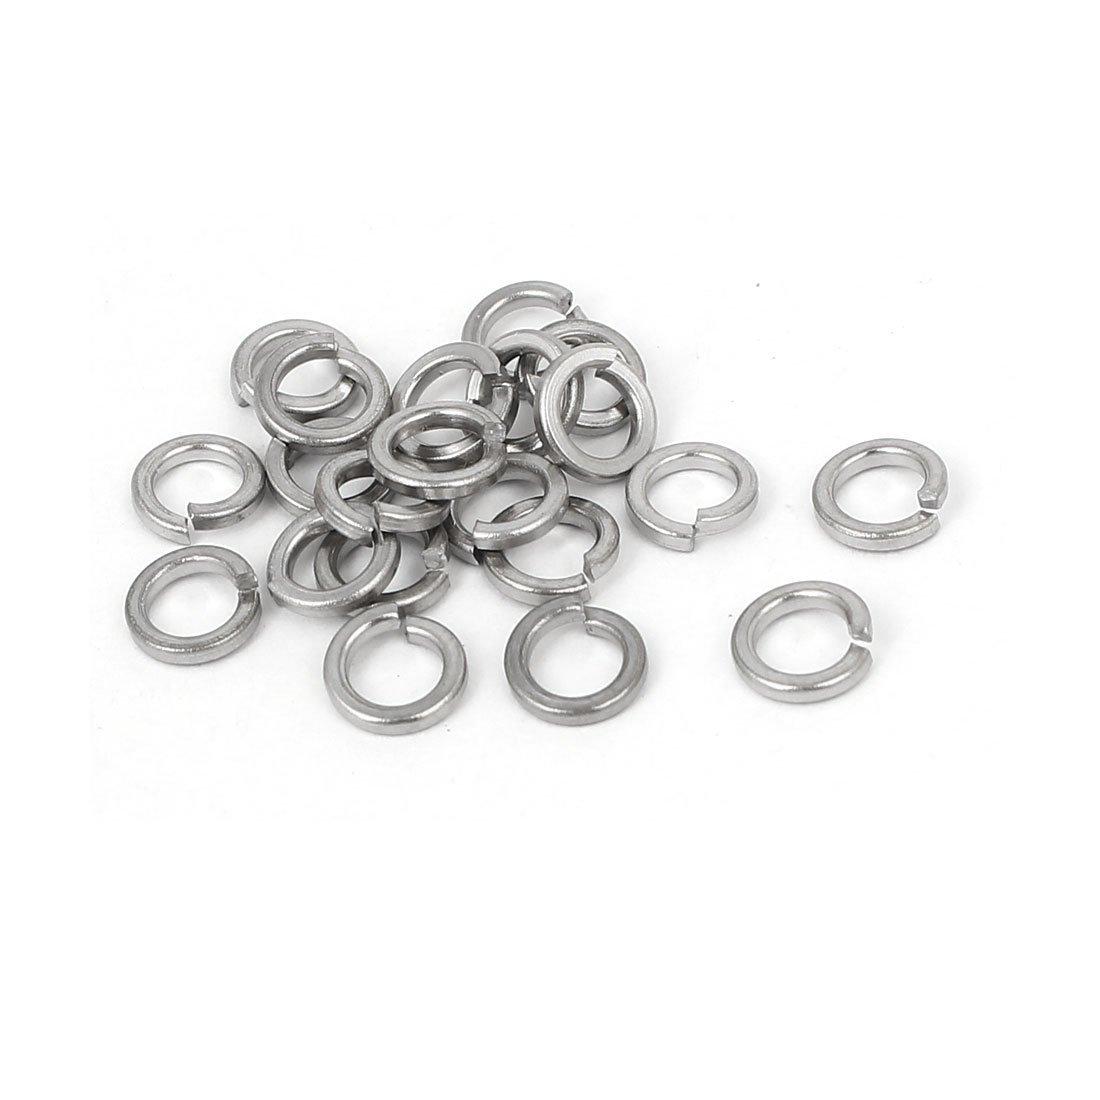 uxcell M4 Inner Diameter Split Lock Stainless Steel Spring Washer Screw Gasket 21pcs